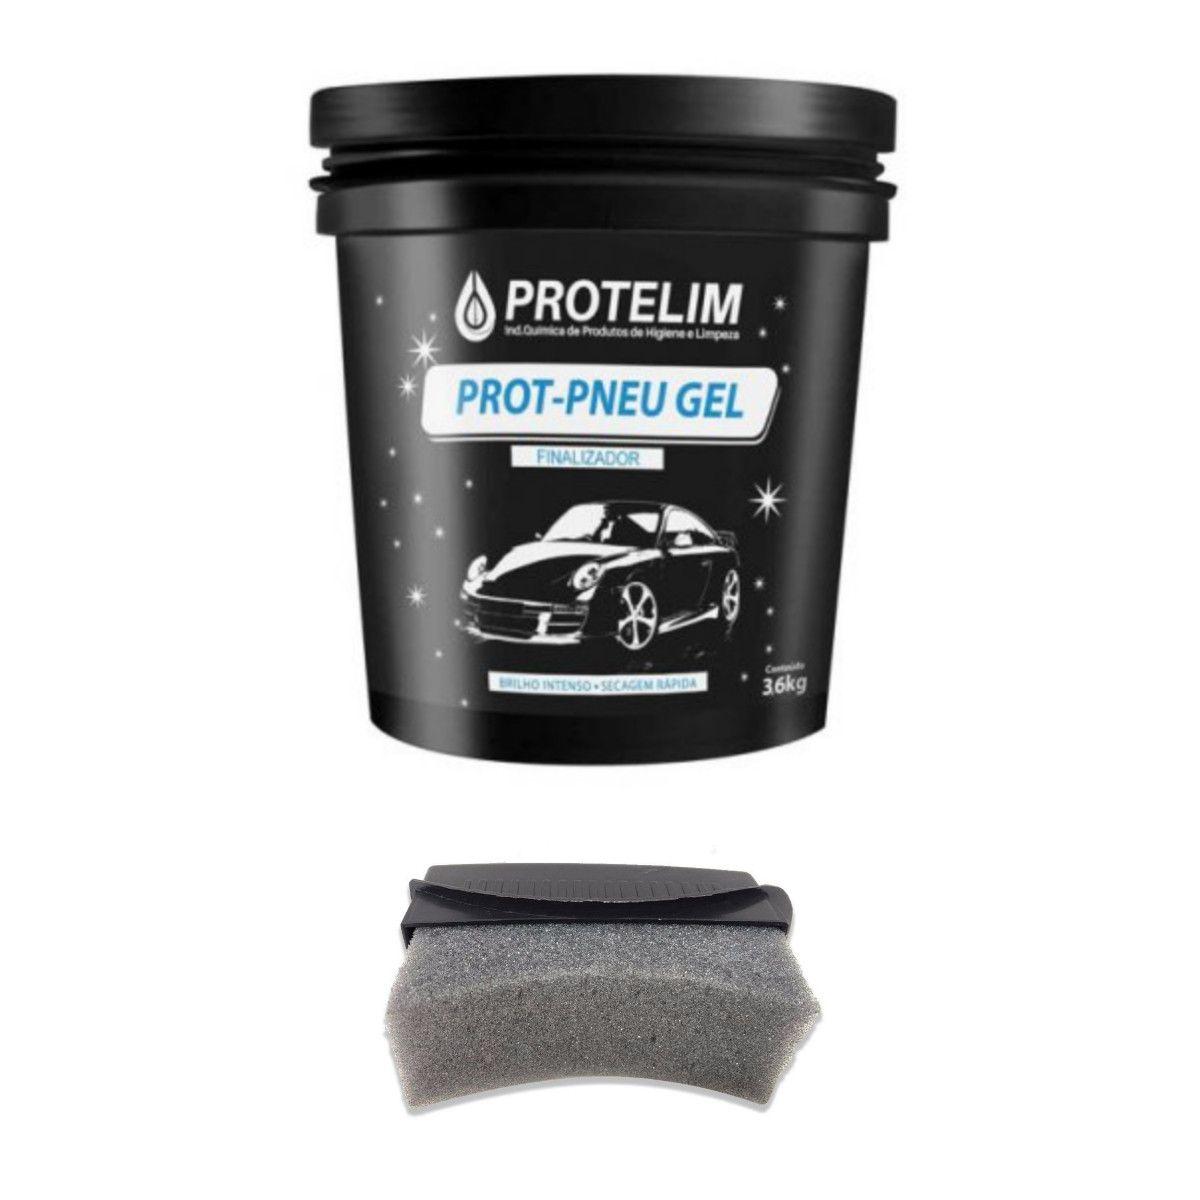 2 Unid Prot Pneu Gel 3,6kg Protelim (BRINDE Espuma Aplicadores)